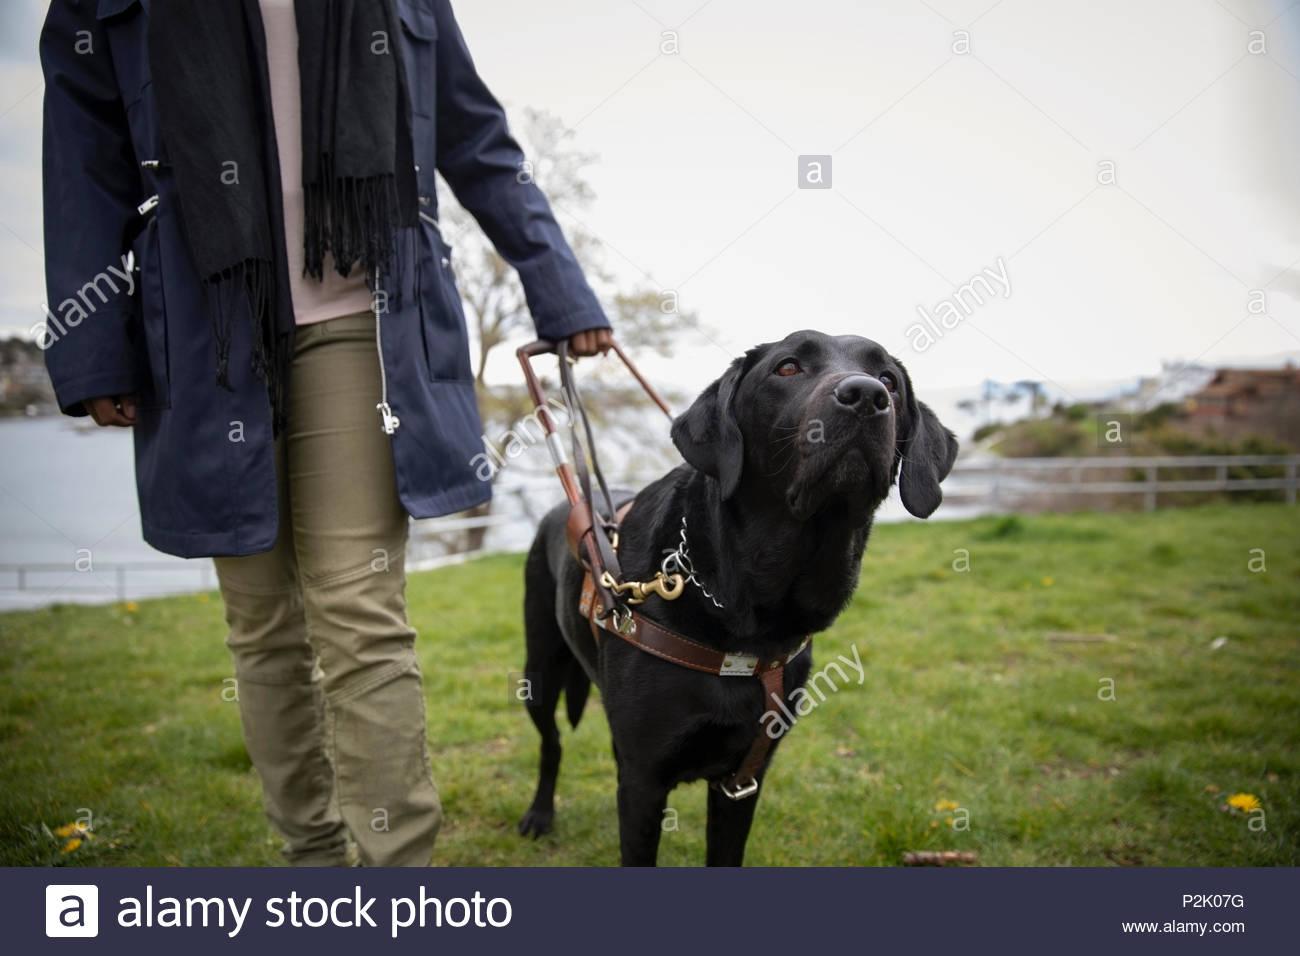 Black seeing eye dog leading visually impaired woman - Stock Image